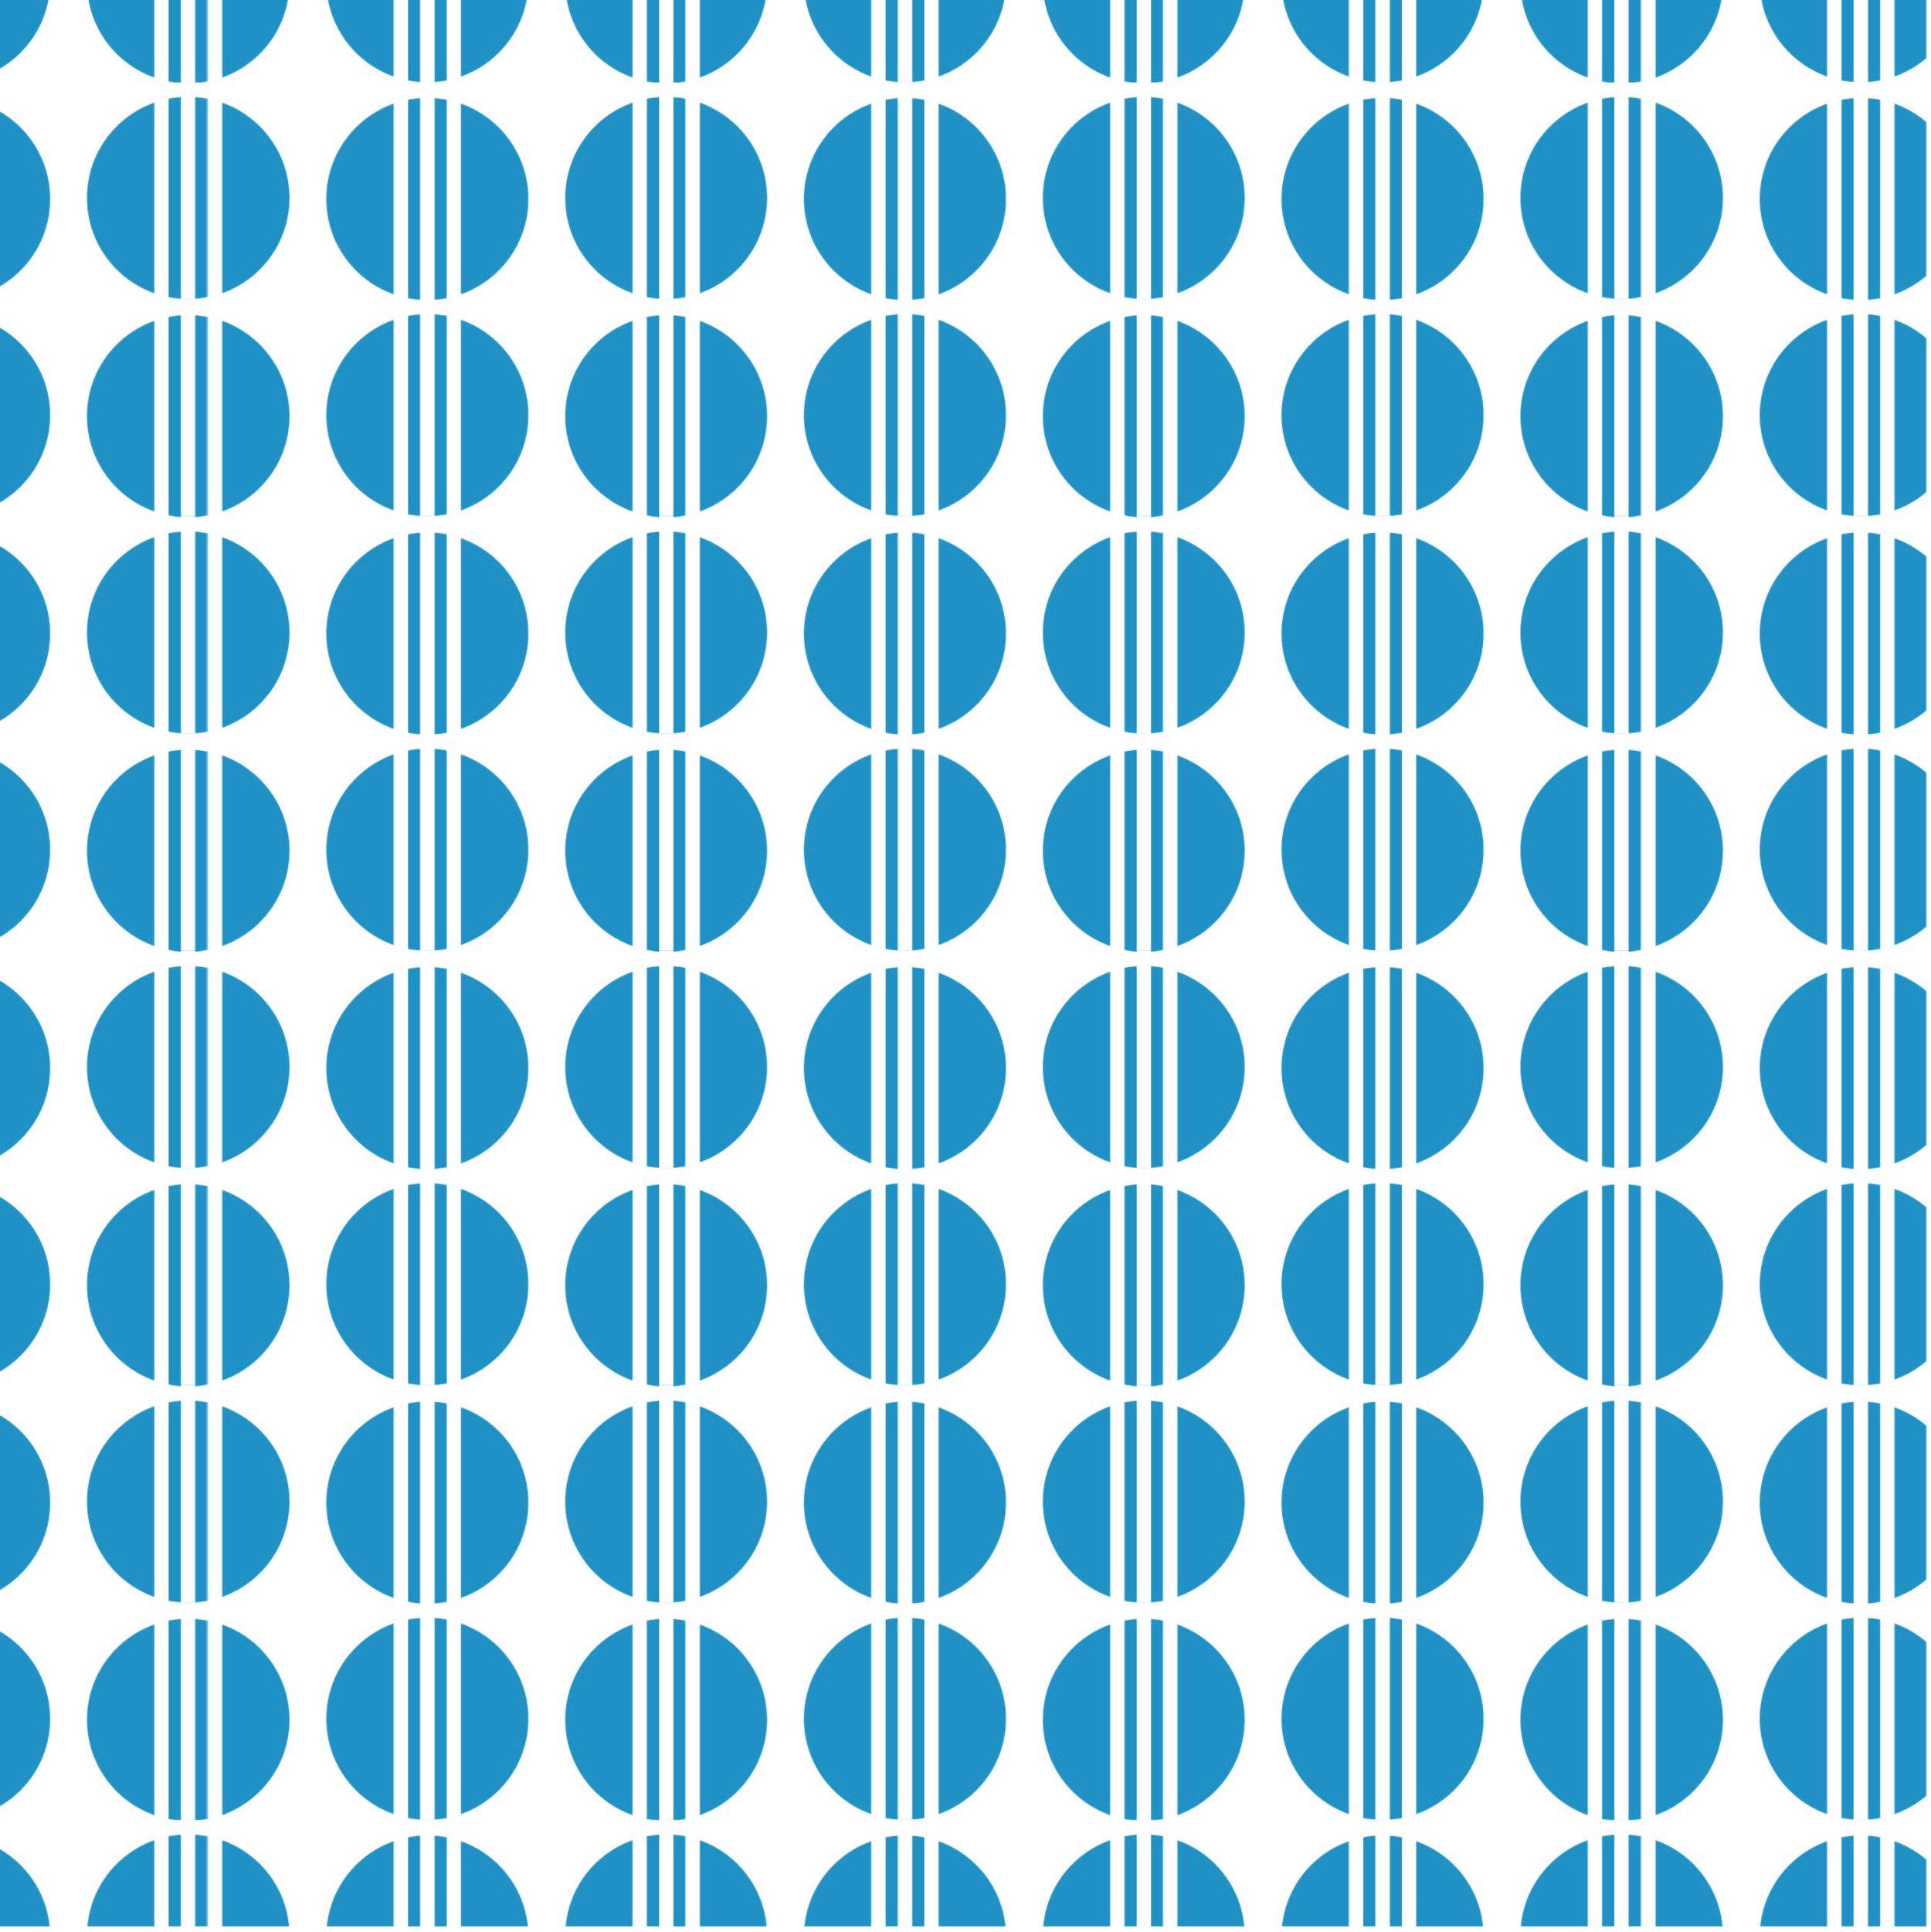 patterns for texas-21.jpg